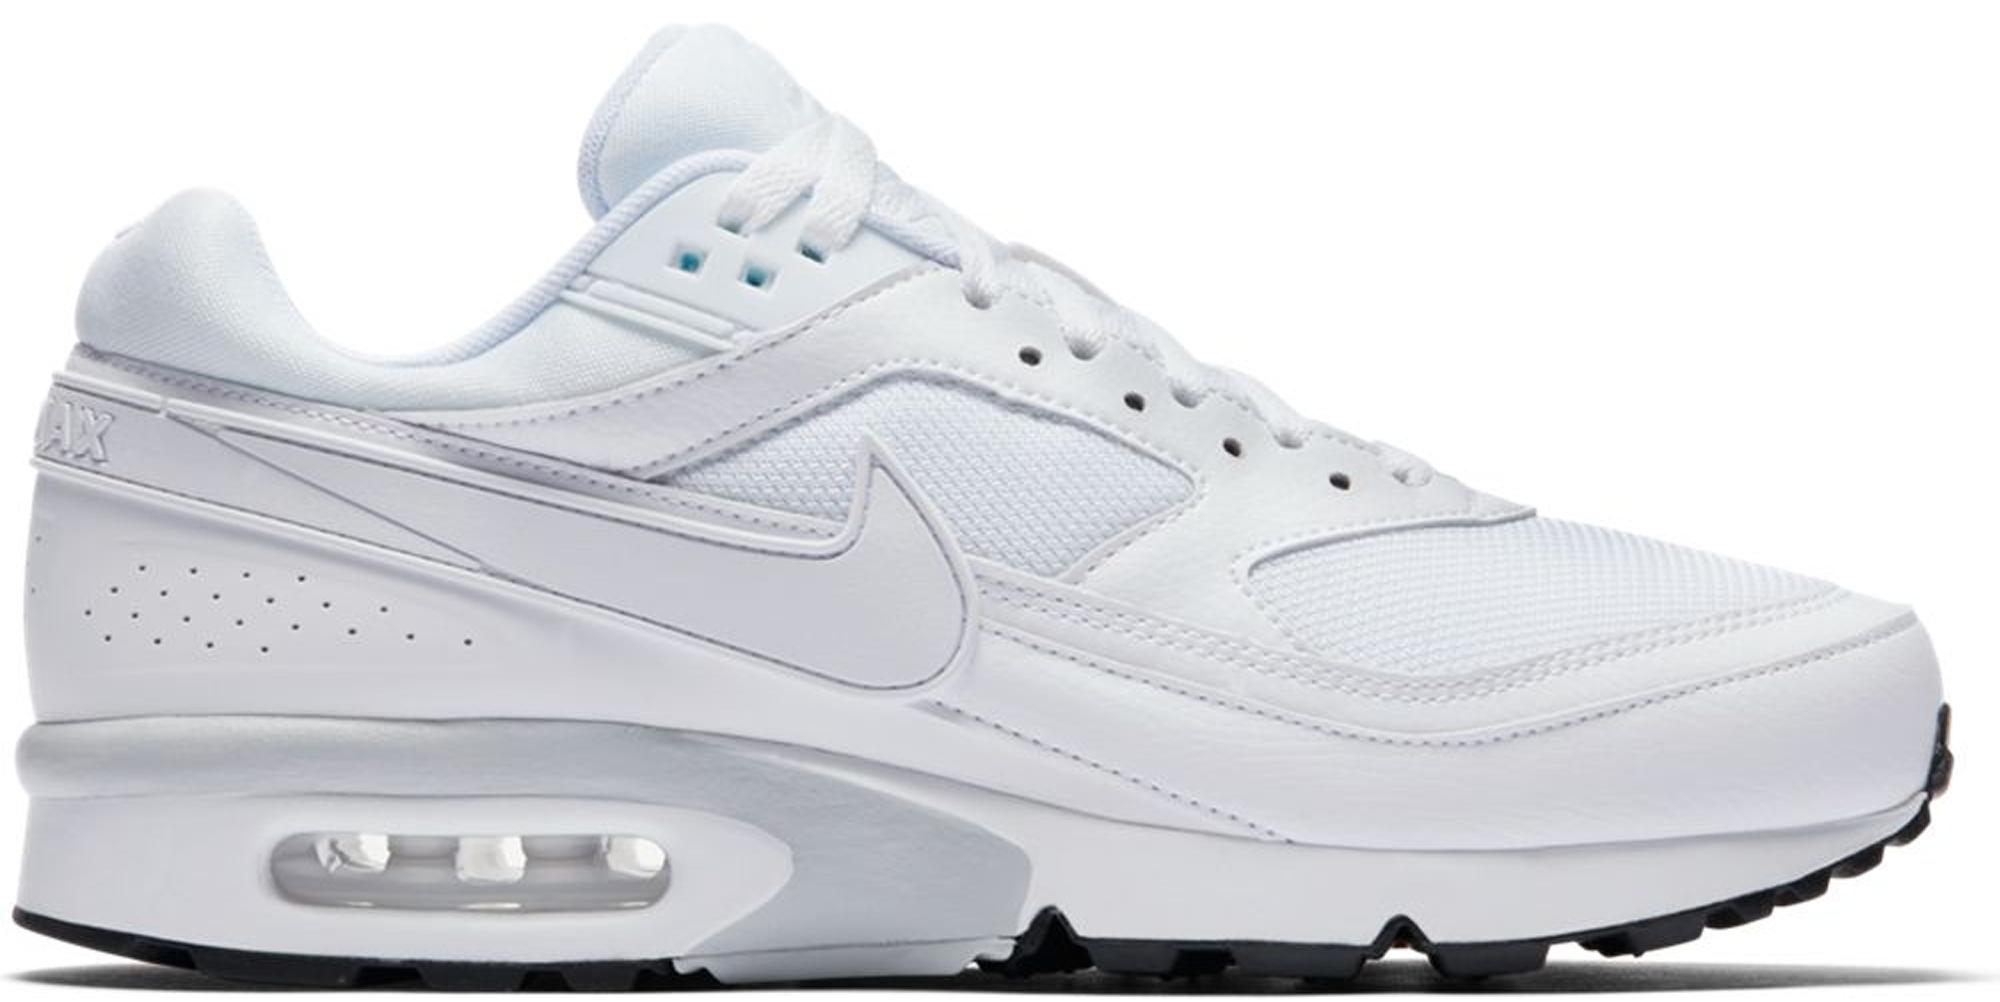 Nike Air Max BW White Pure Platinum